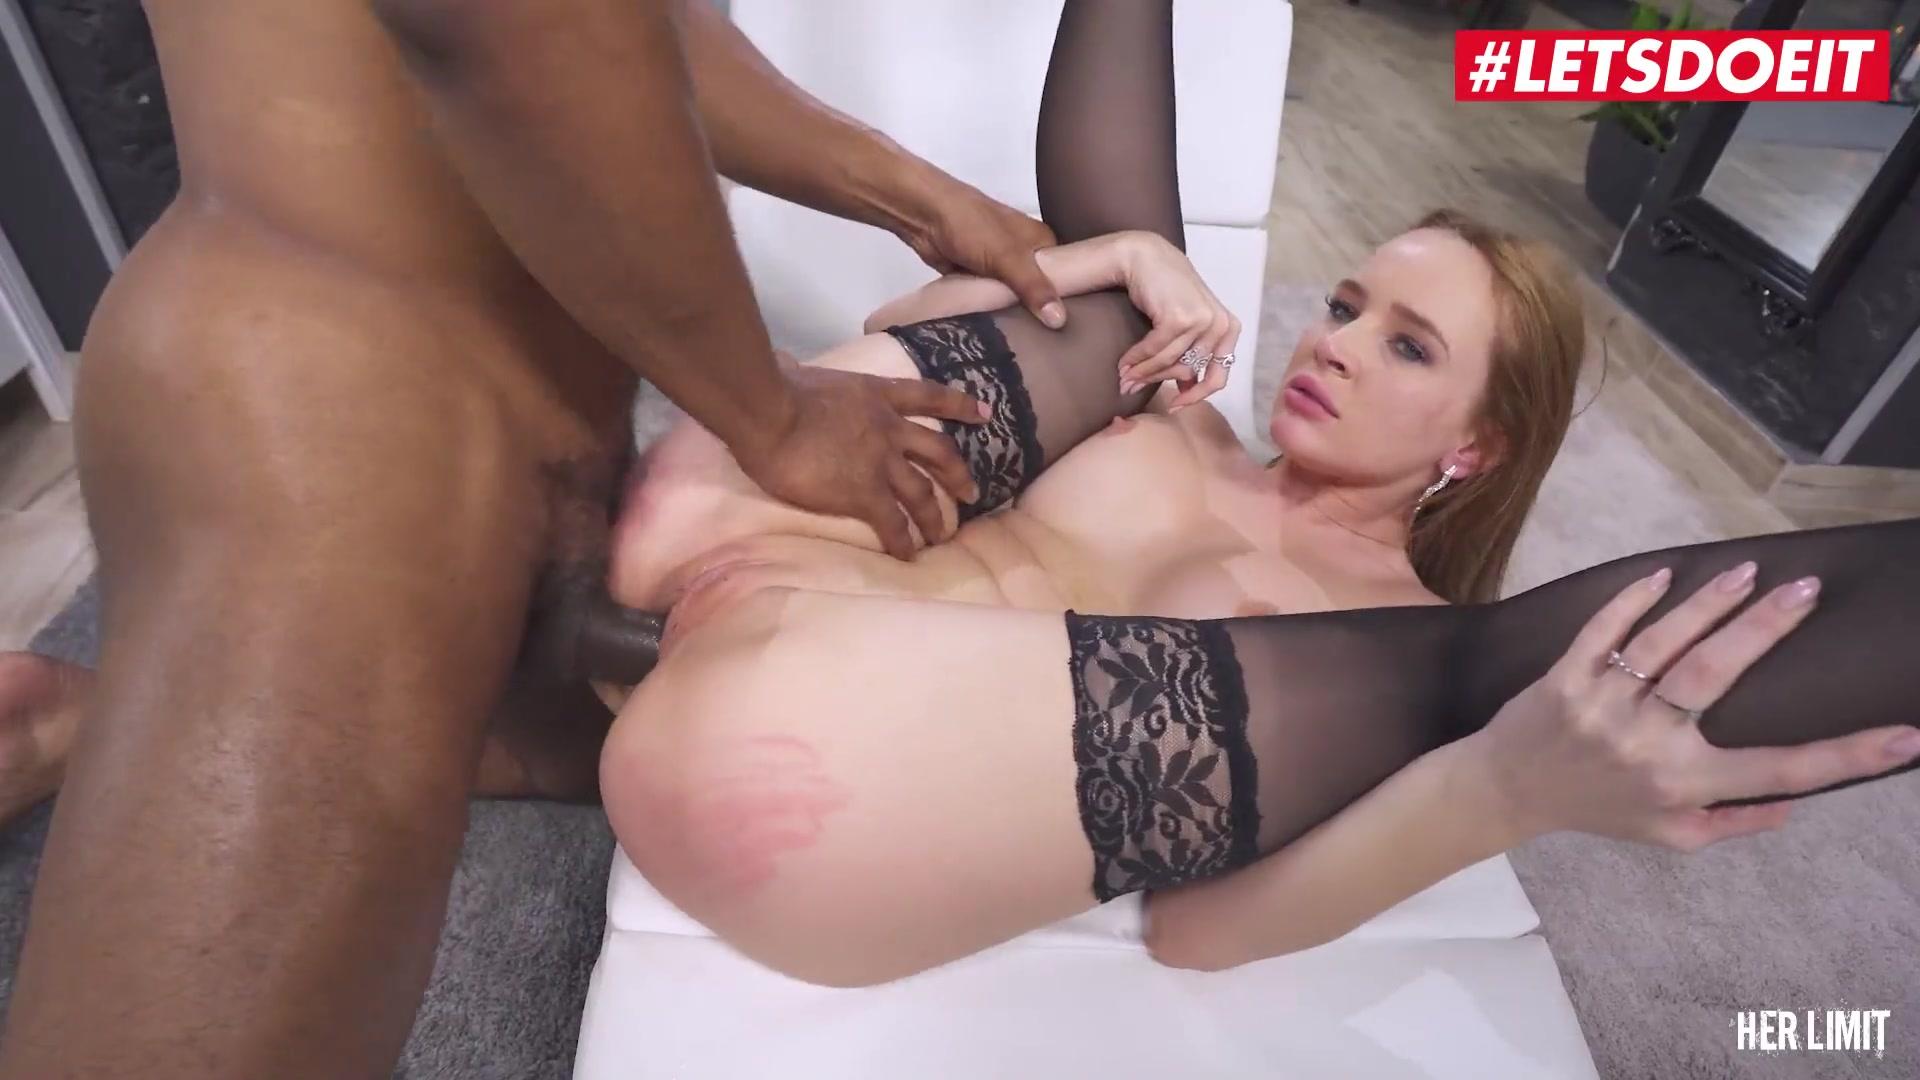 HerLimit - Kaisa Nord Kinky Russian Babe Hardcore Interracial Anal Sex - LETSDOEIT